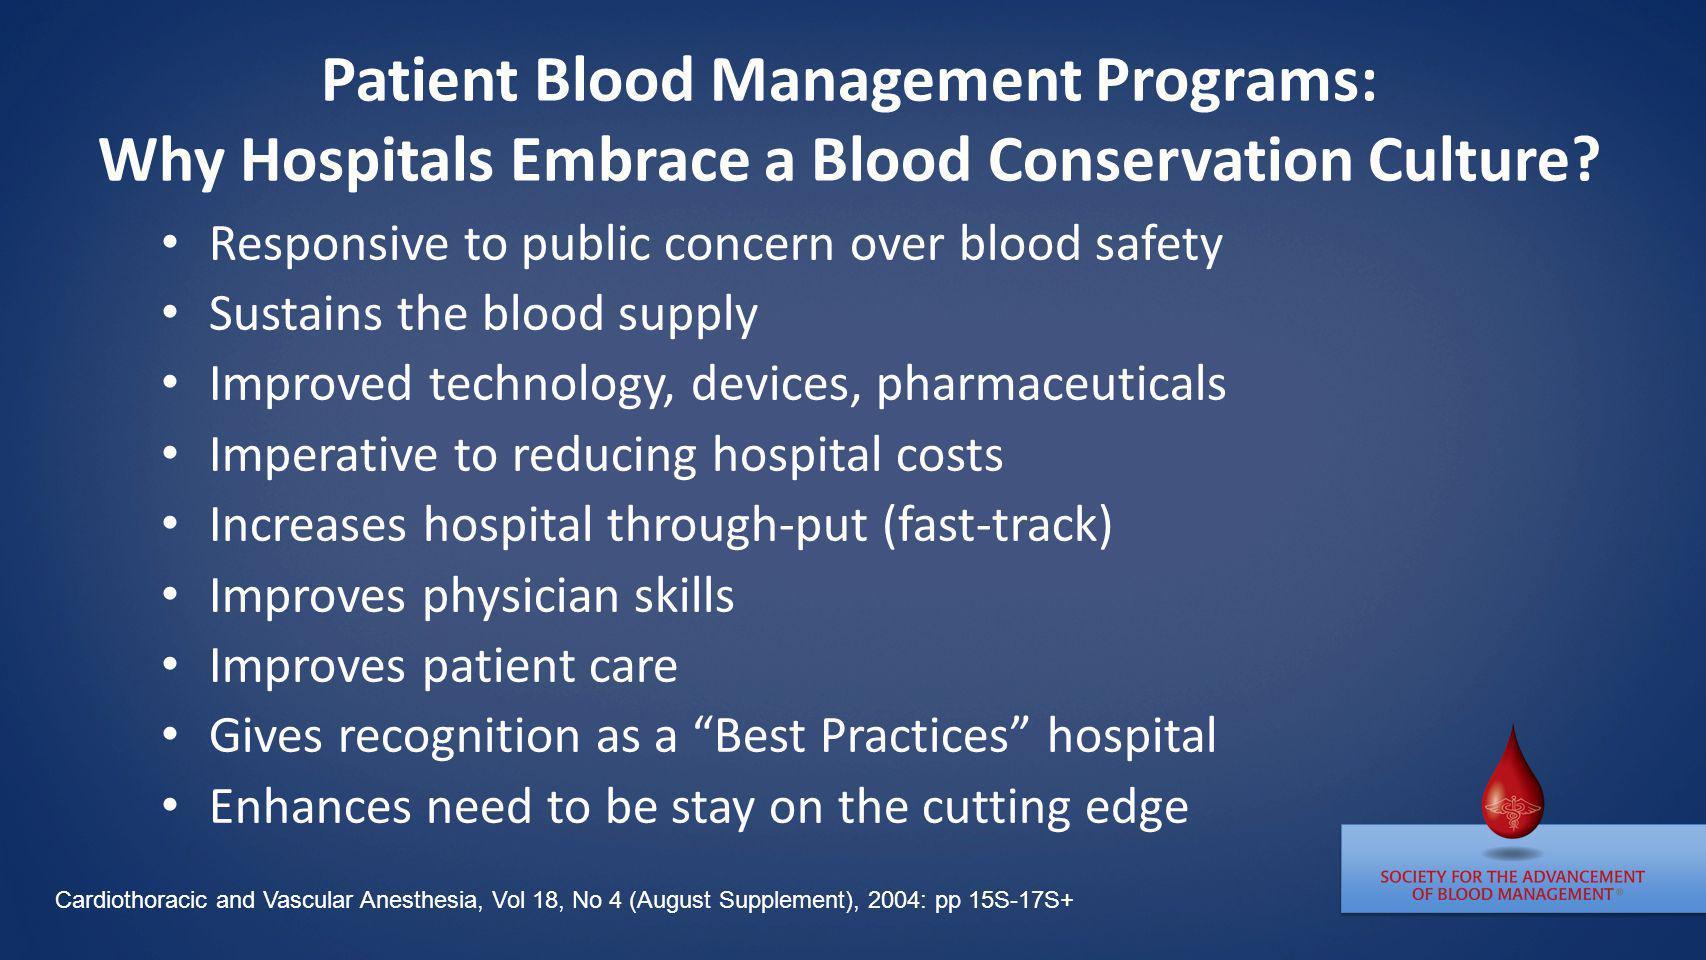 Patient Blood Management Programs: Why Hospitals Embrace a Blood Conservation Culture